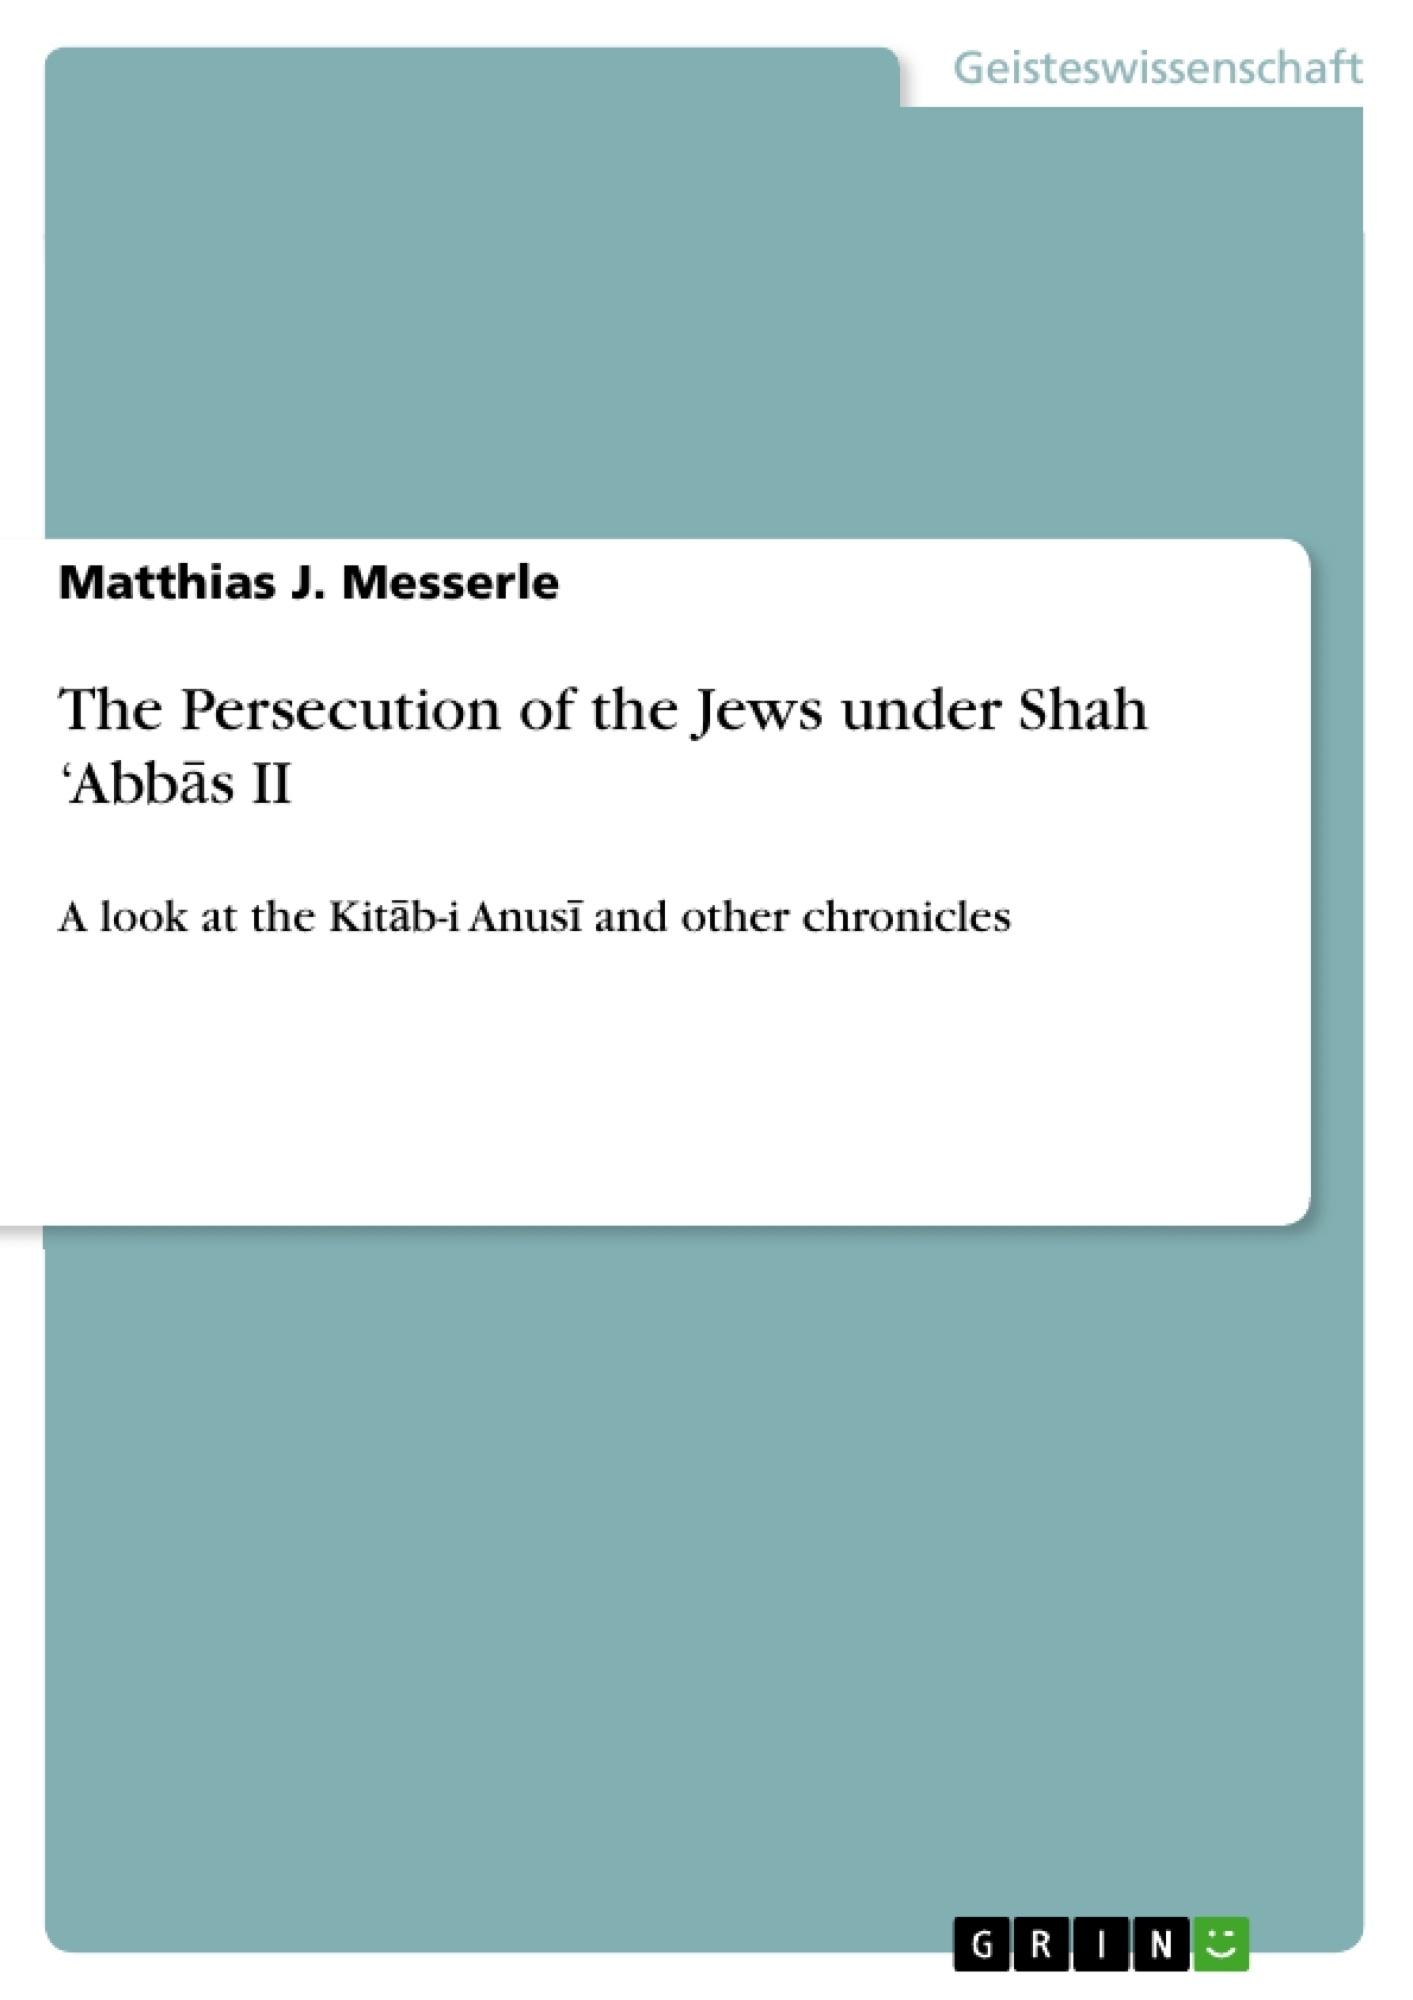 Titel: The Persecution of the Jews under Shah 'Abbās II